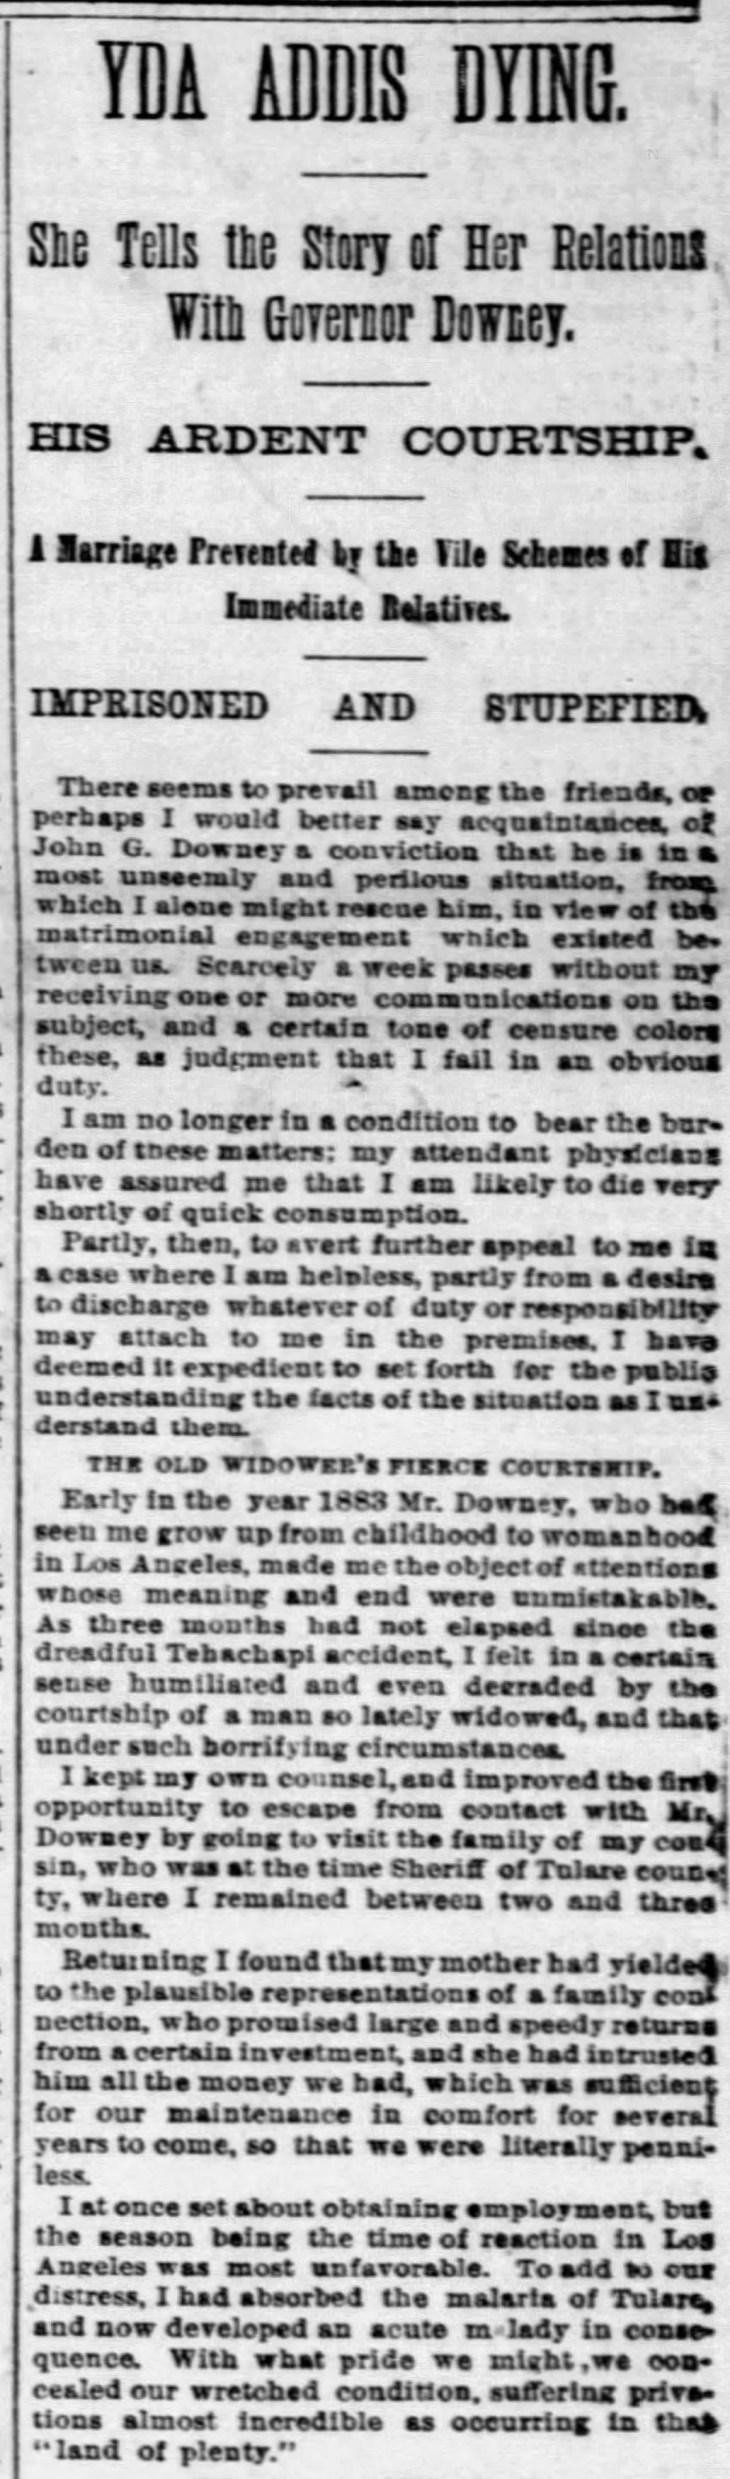 Yda dying detail The_San_Francisco_Examiner_Sun__Apr_22__1888_